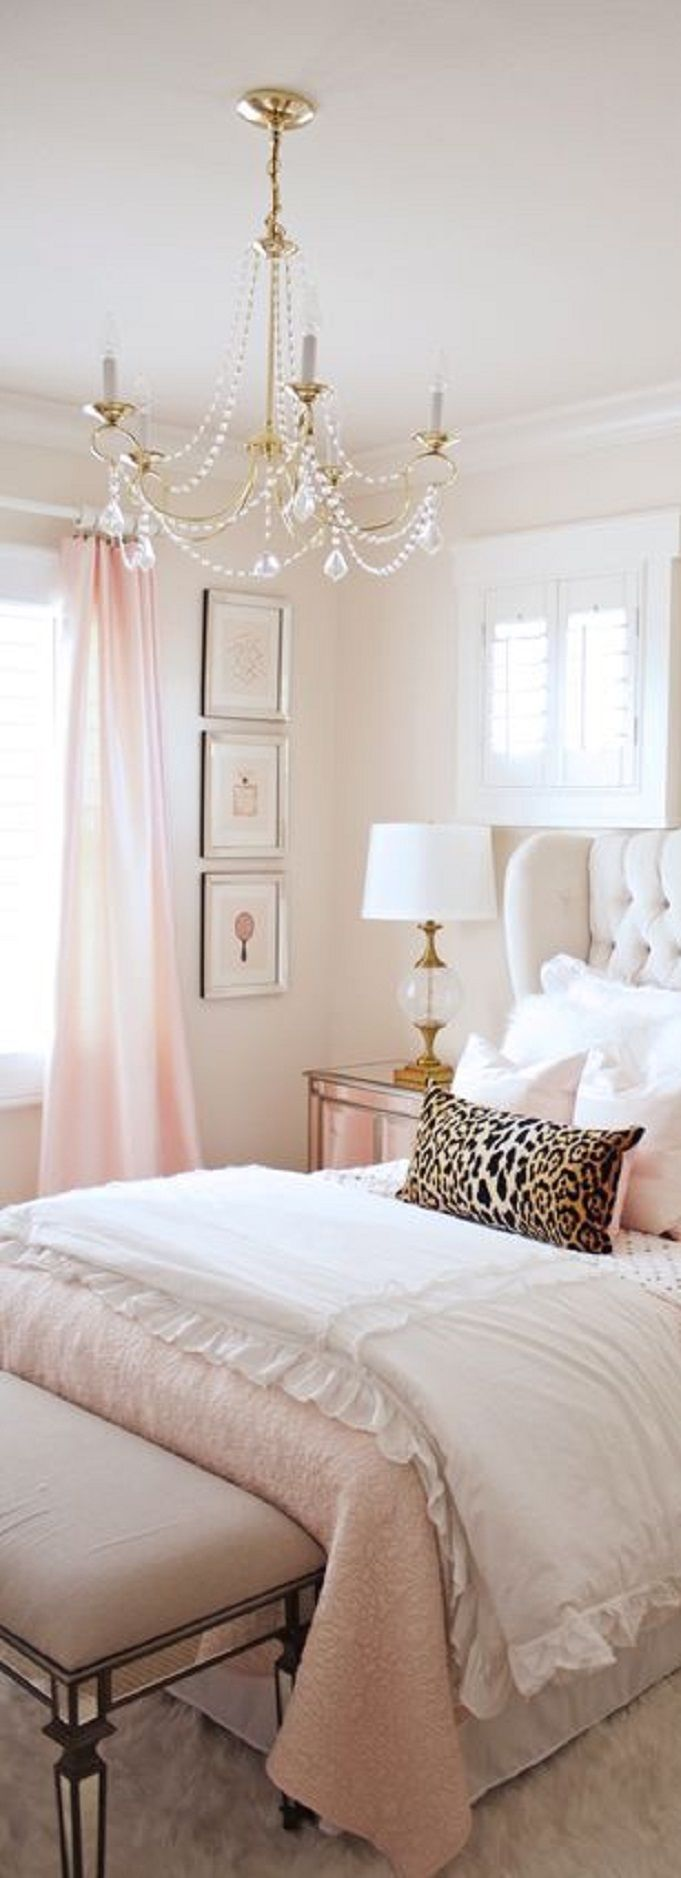 Leopard Bedroom Accessories 17 Best Ideas About Leopard Bedroom Decor On Pinterest Leopard